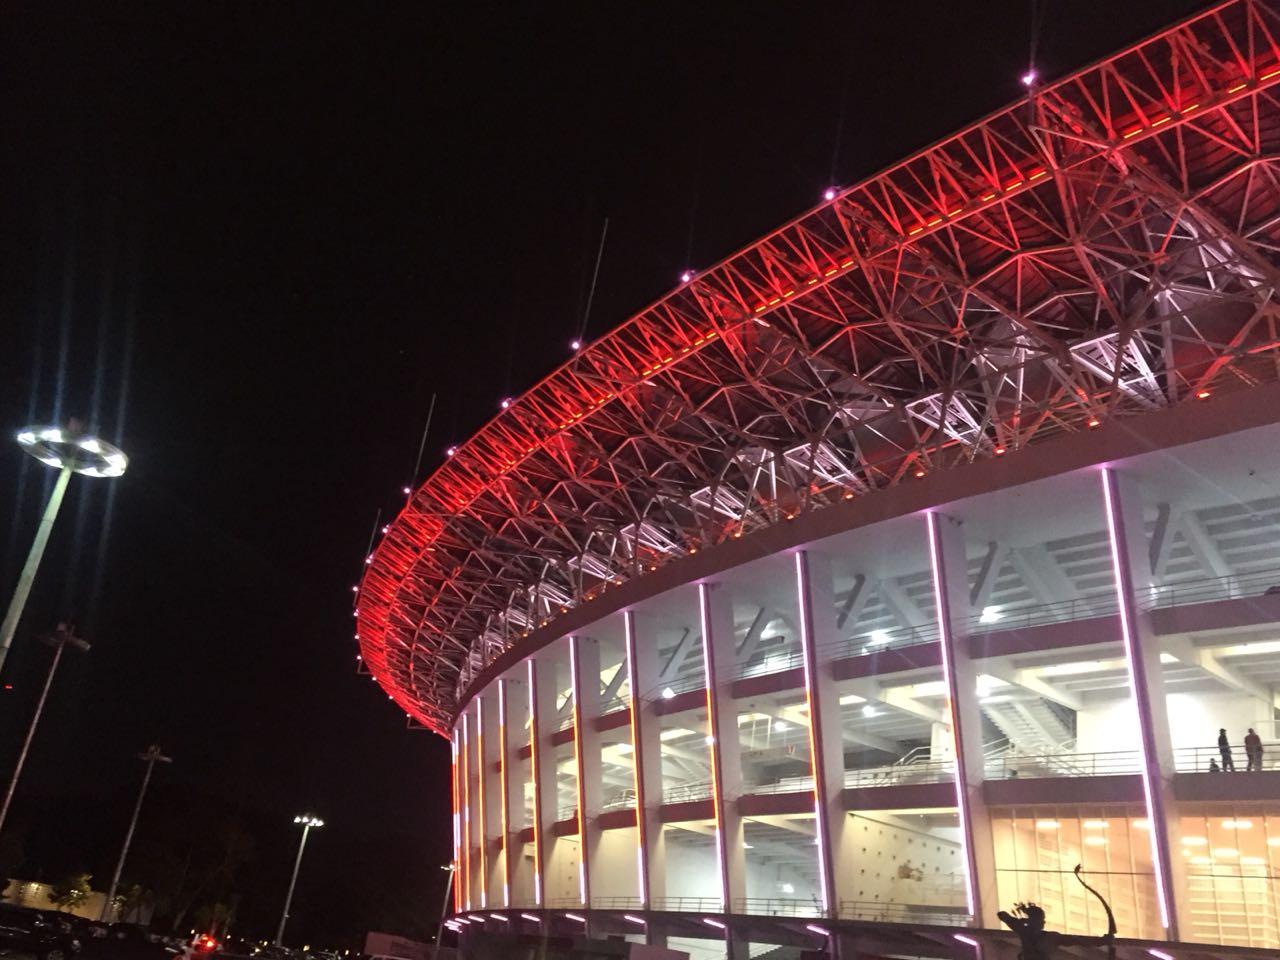 https: img.okeinfo.net content 2018 01 12 470 1844340 indonesia-siap-gelar-asian-games-2018-renovasi-gbk-telan-dana-hingga-rp2-6-triliun-DVthwI2TnQ.jpg